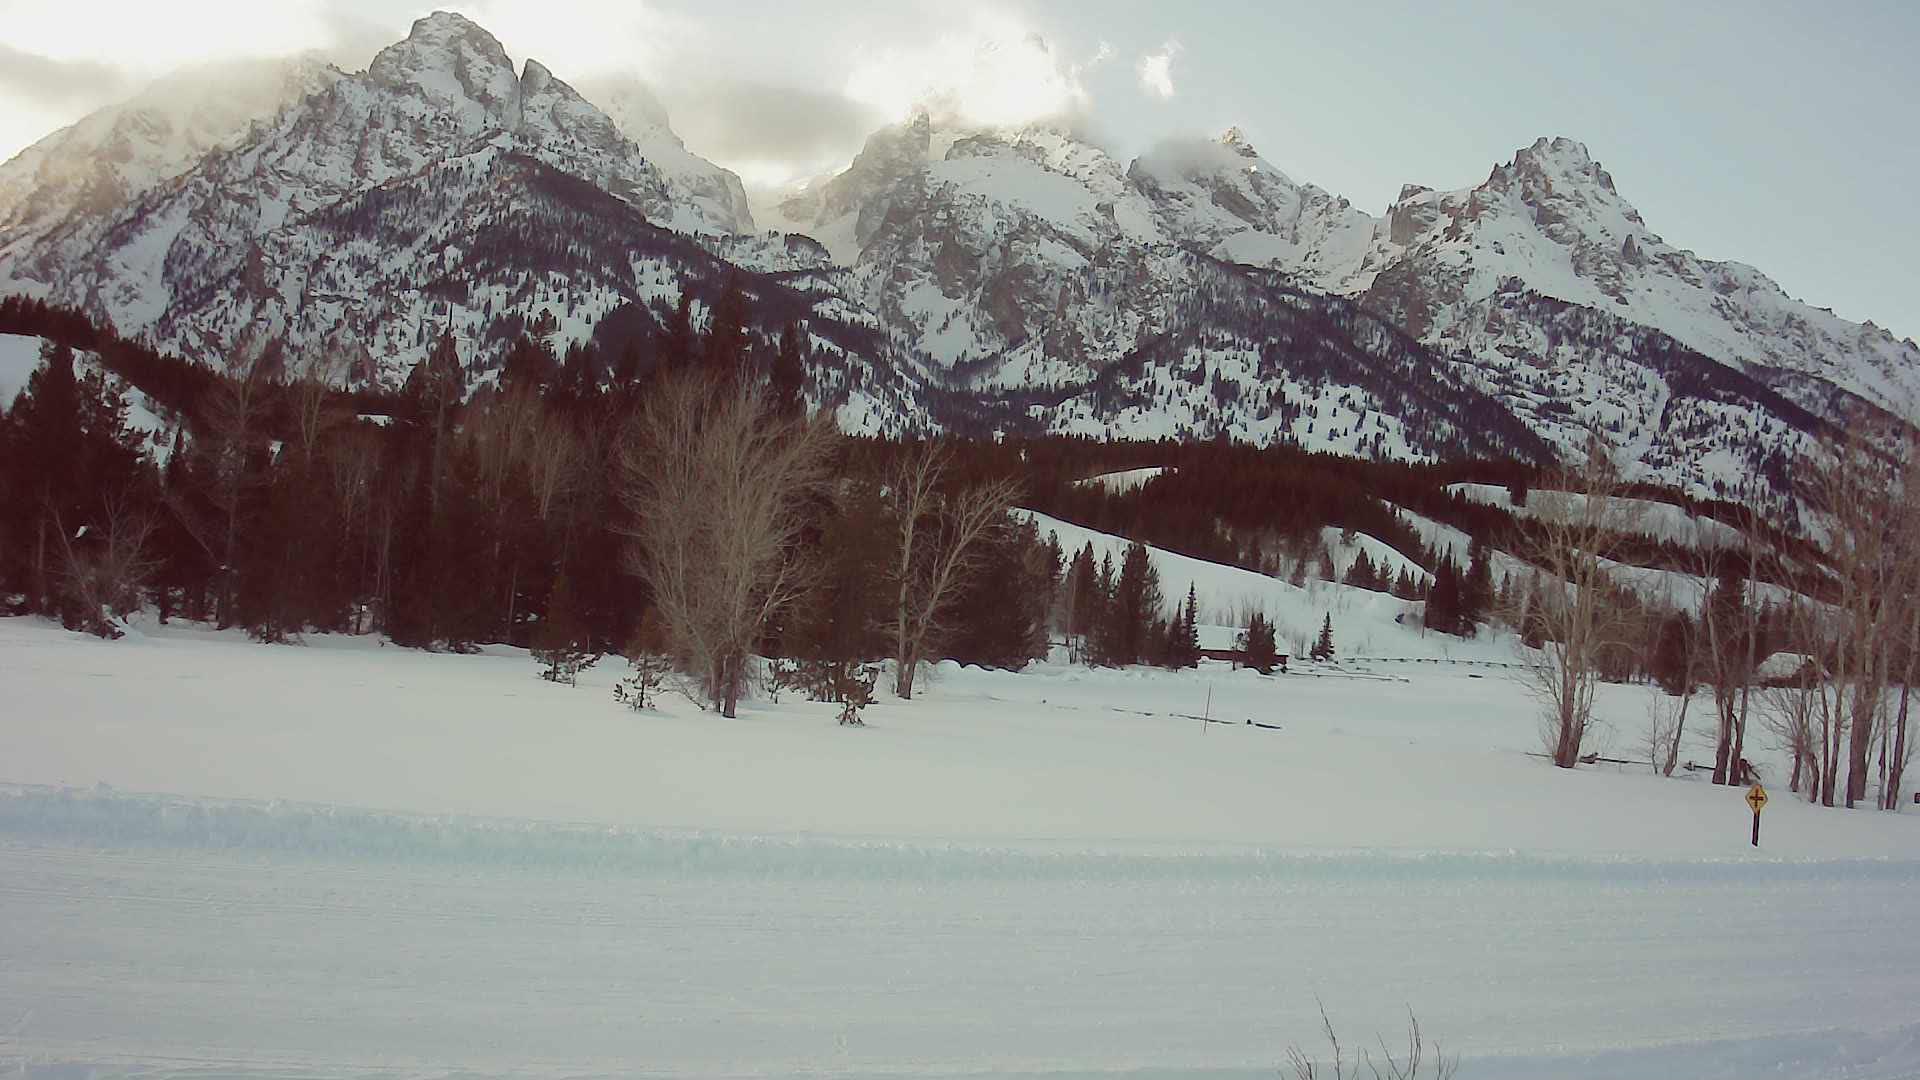 Jenny lake trail head at 2/25/2020 05:12:50 PM